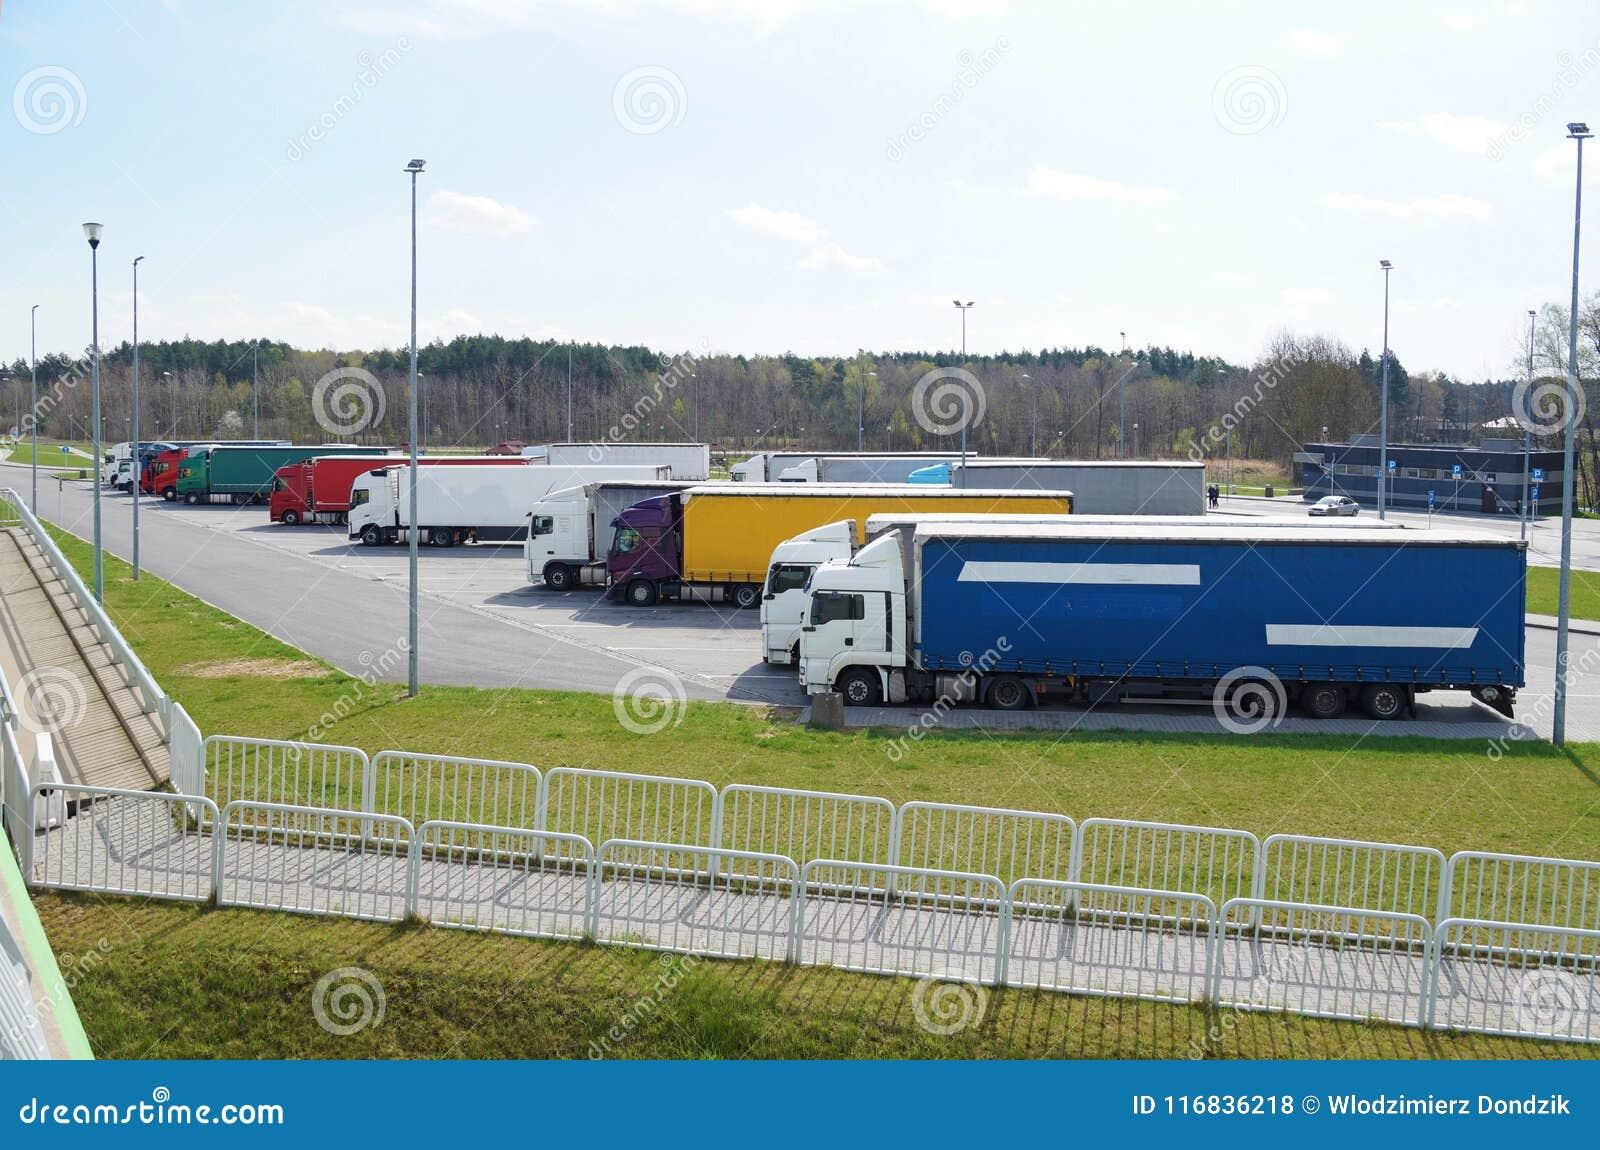 Weekend break in drivers` work. Rest area filled with lorries.